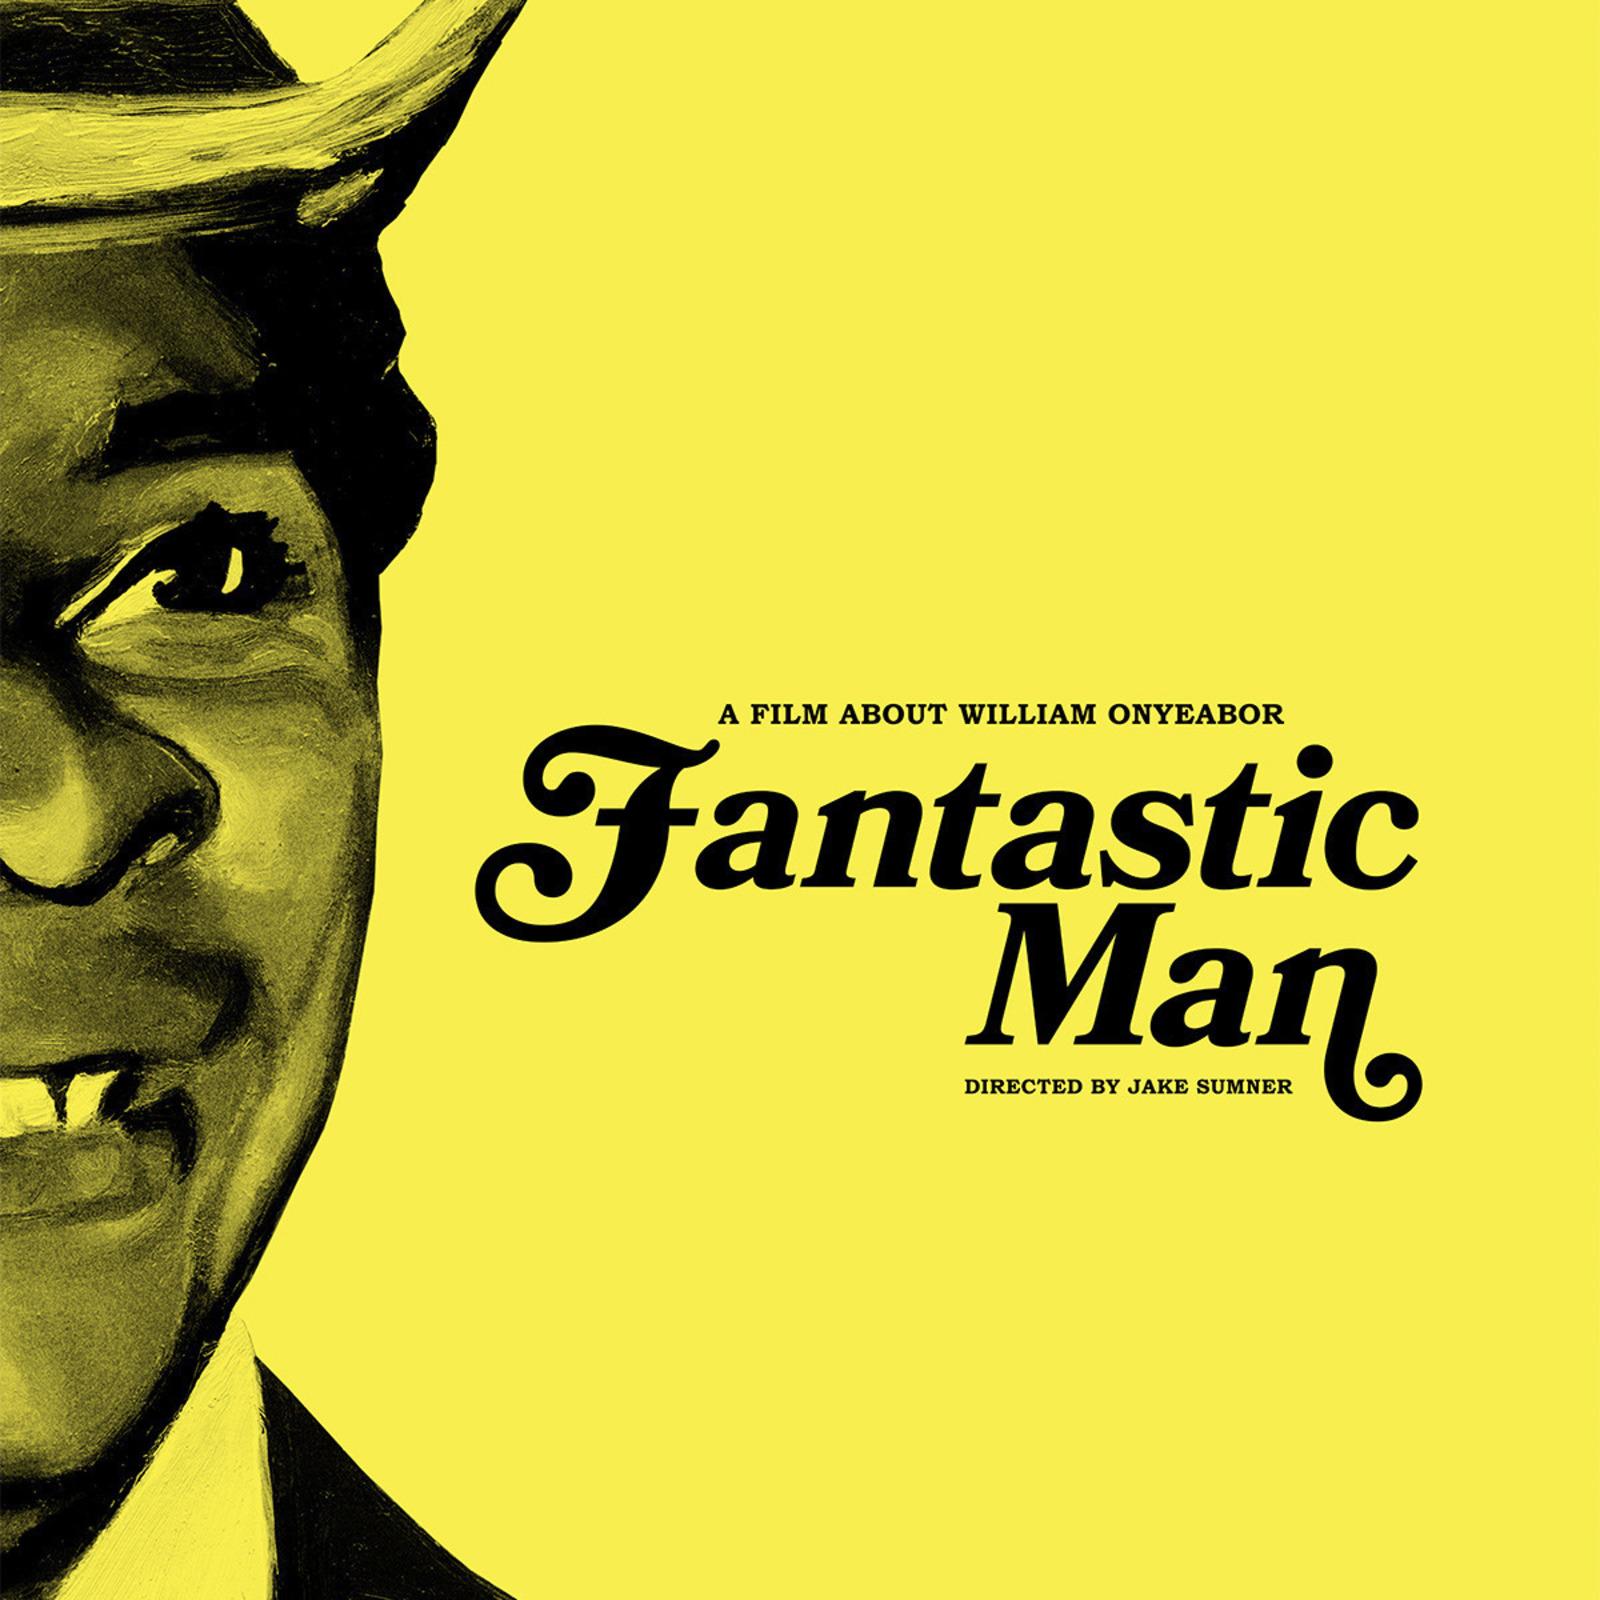 fantastic man film.jpg